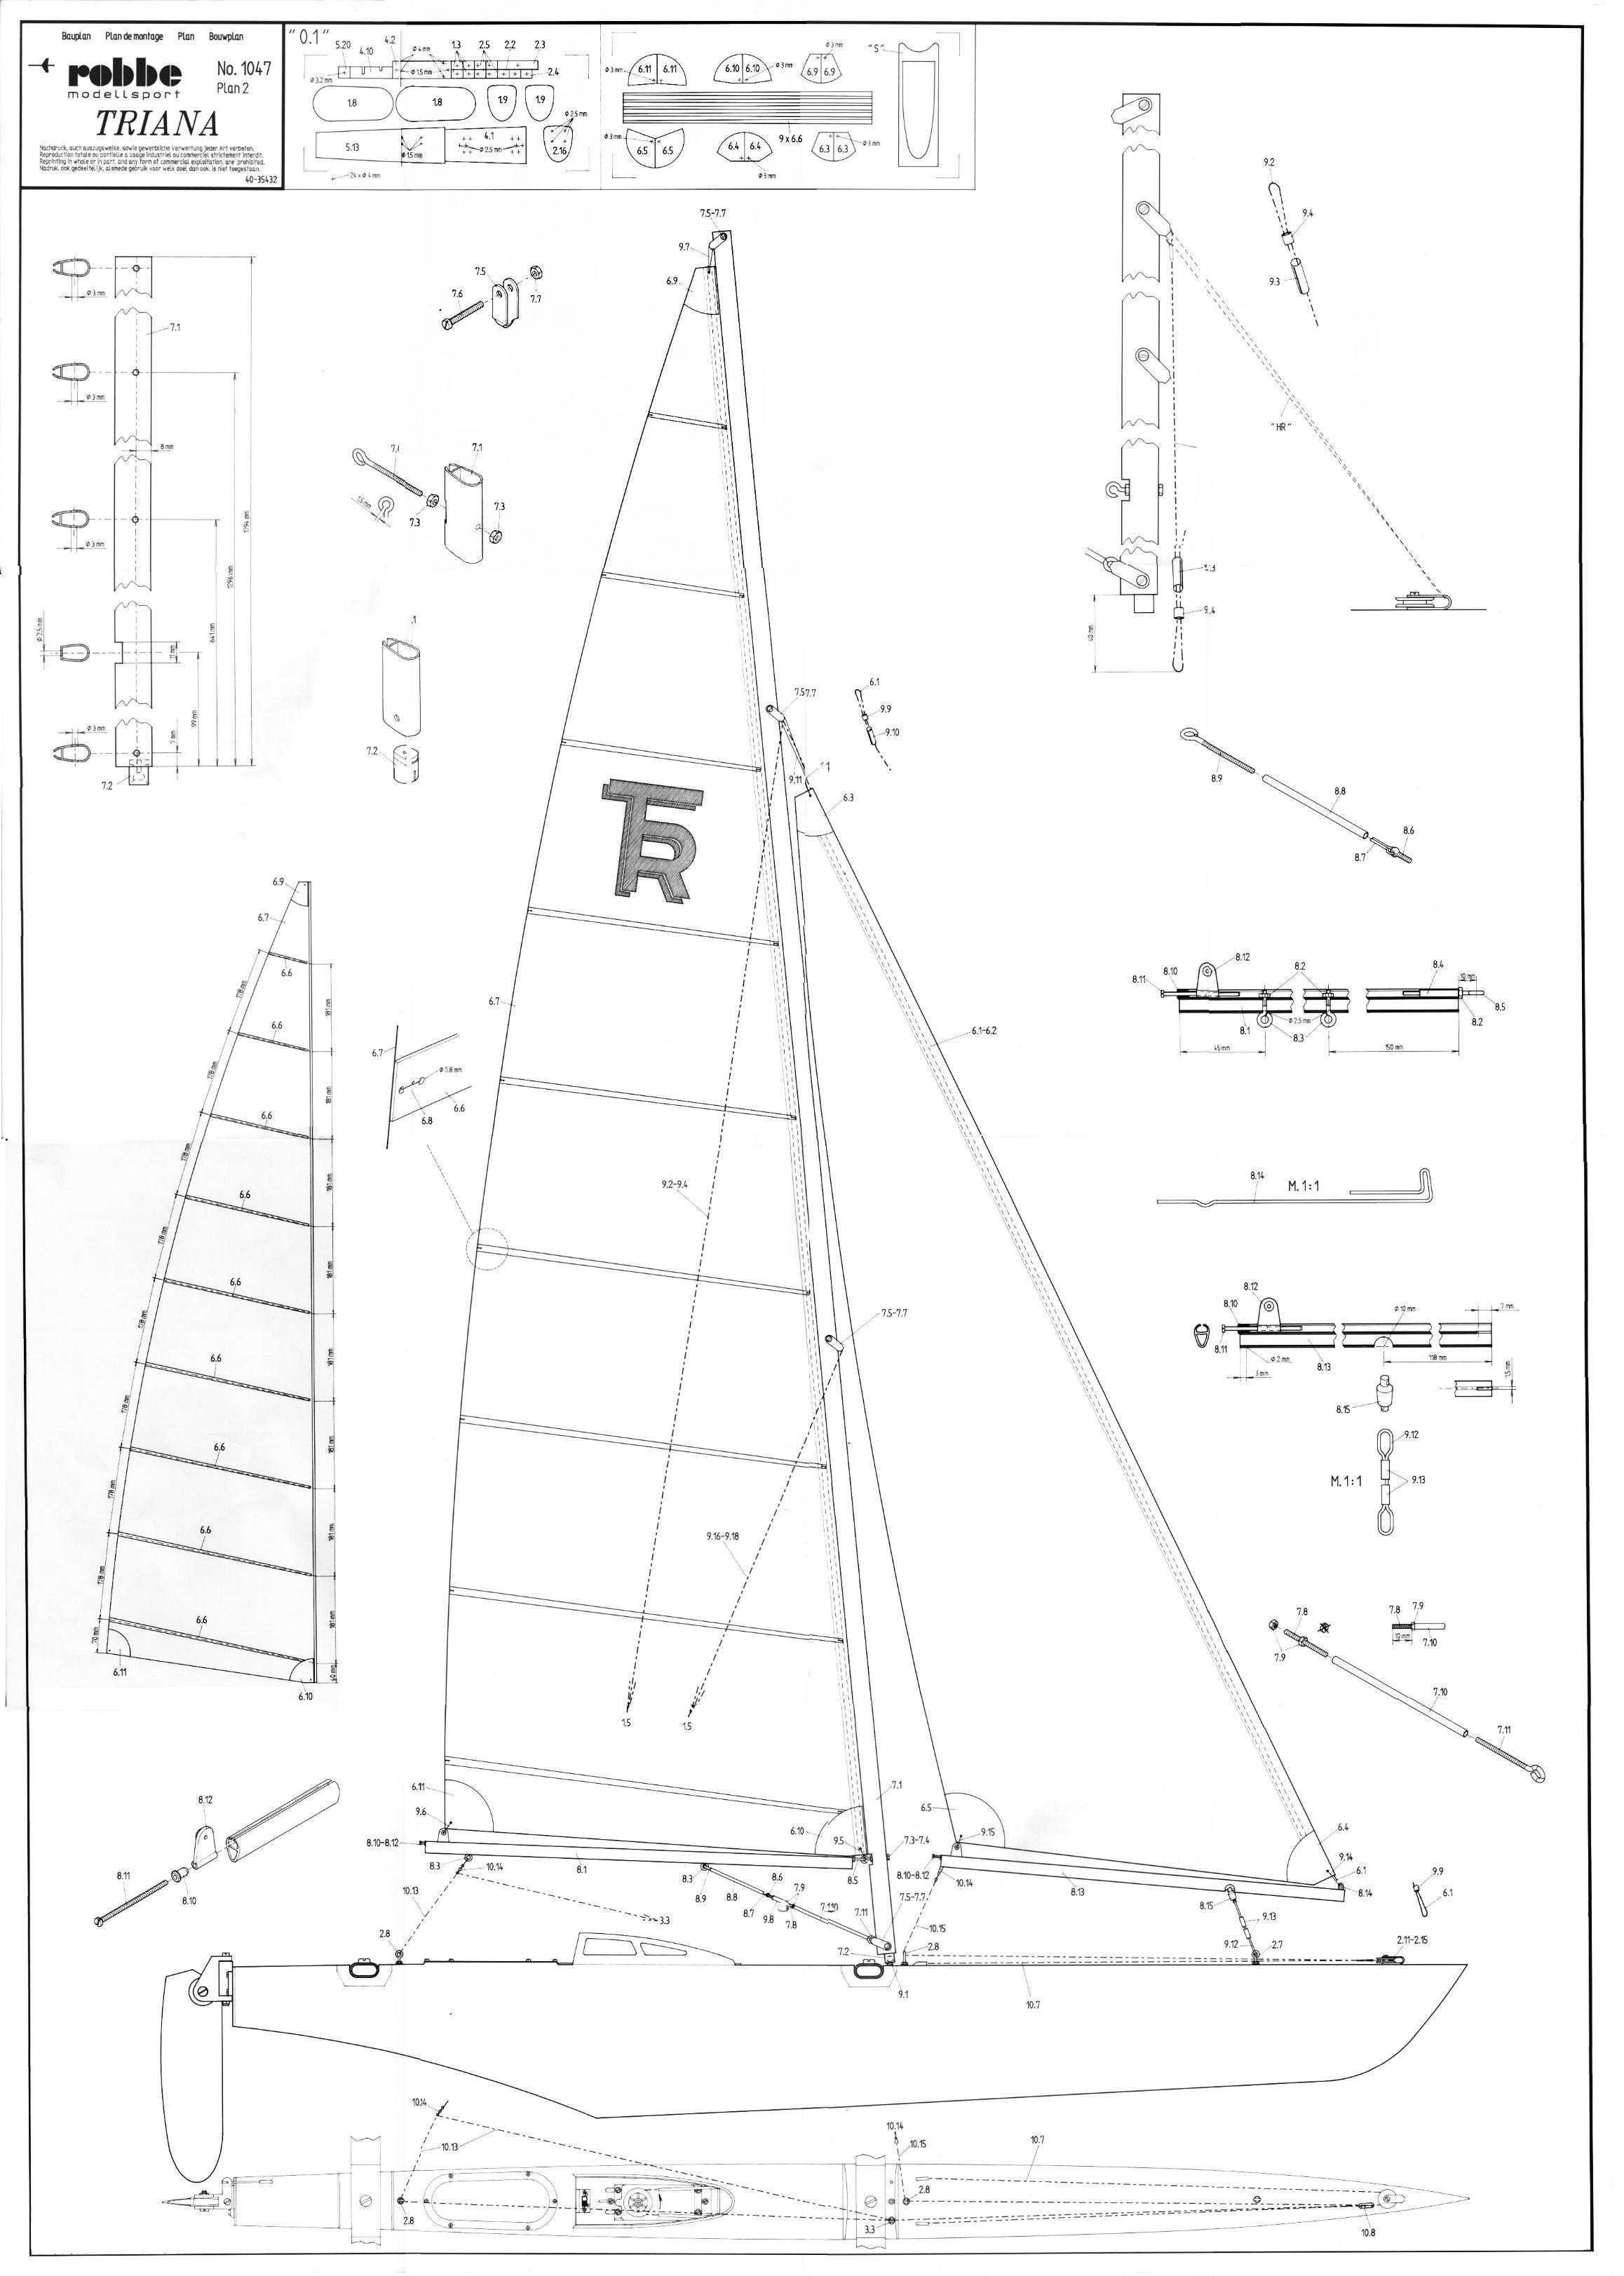 medium resolution of iwema enterprise the power of rc multi hull sailing plans triana hunter sailboat diagram power sailboat diagram